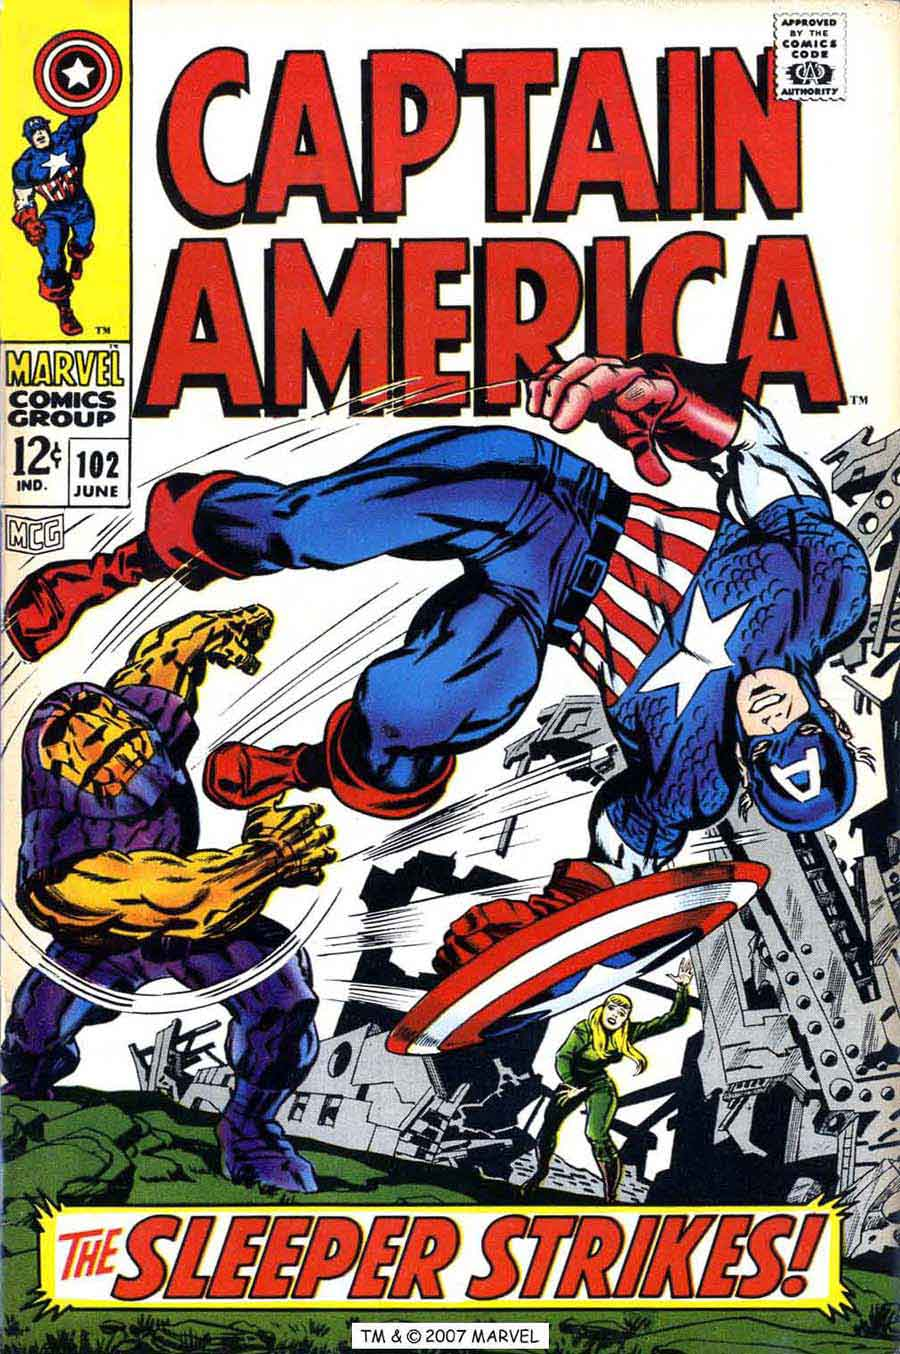 Captain America v1 #102 marvel comic book cover art by Jack Kirby